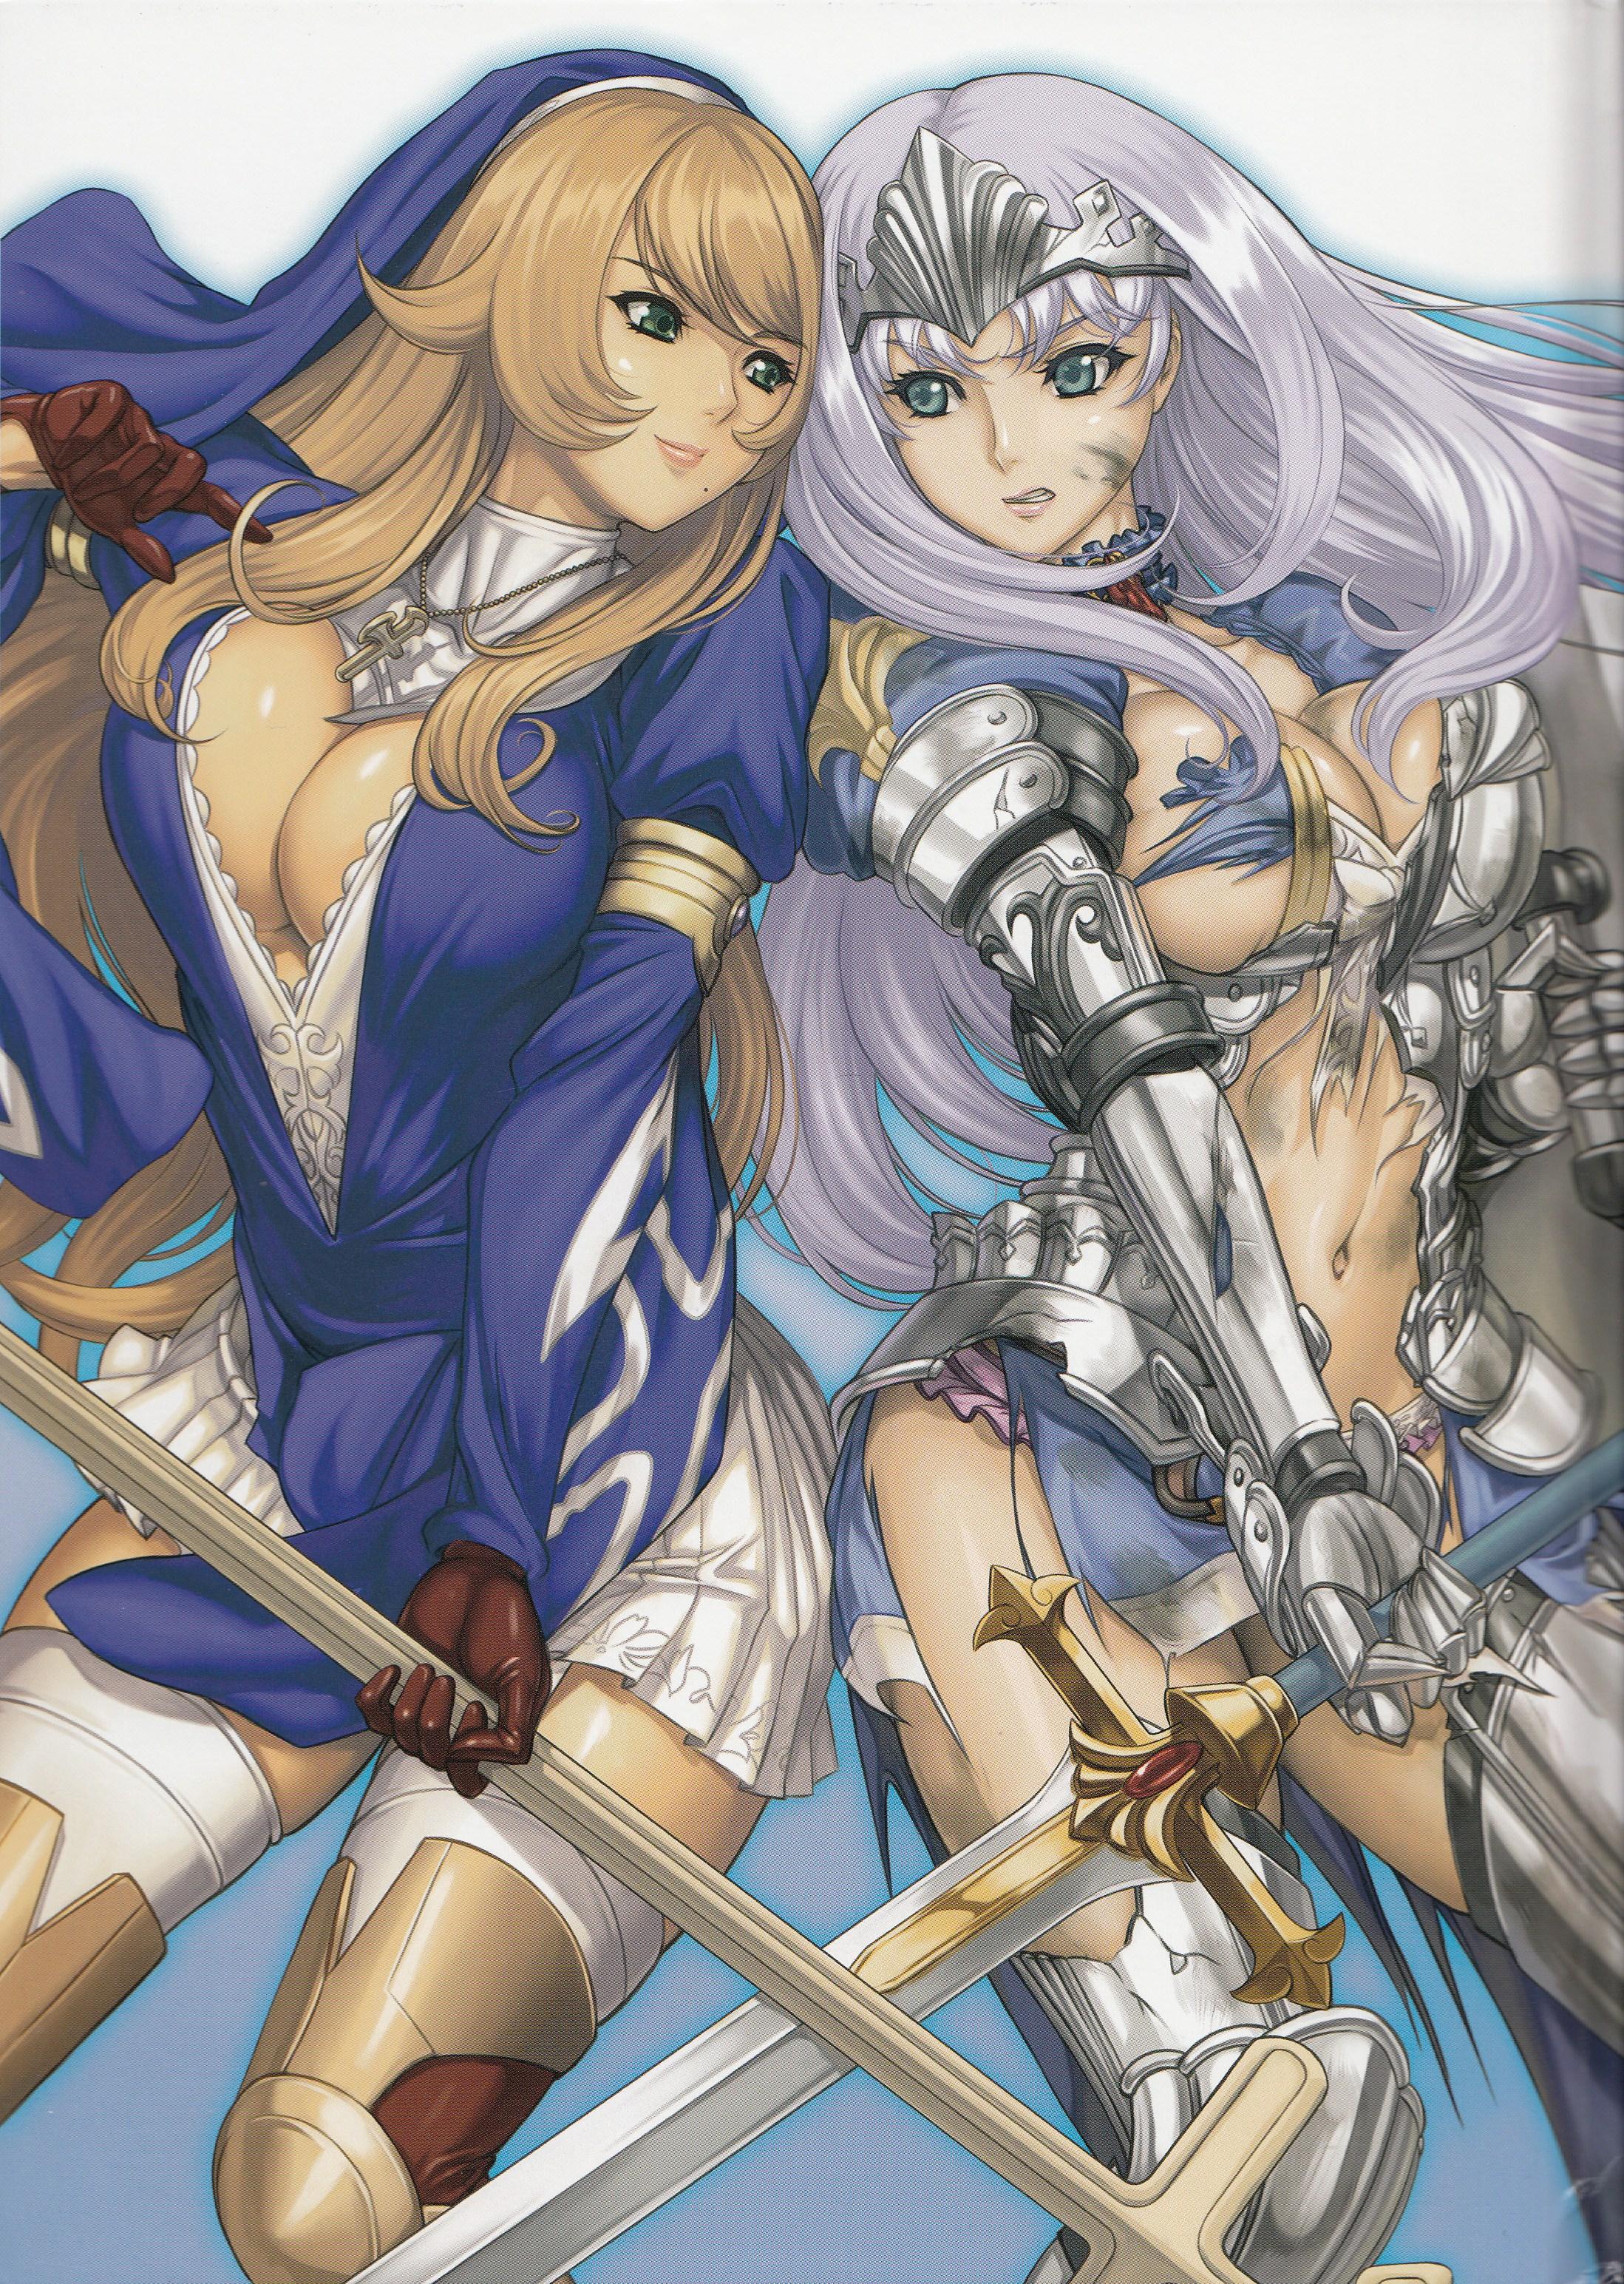 Клинок Королевы OVA-2 / Queen's Blade / ク イ-ン ズ ブ レ イ ド. Жанр. боевые